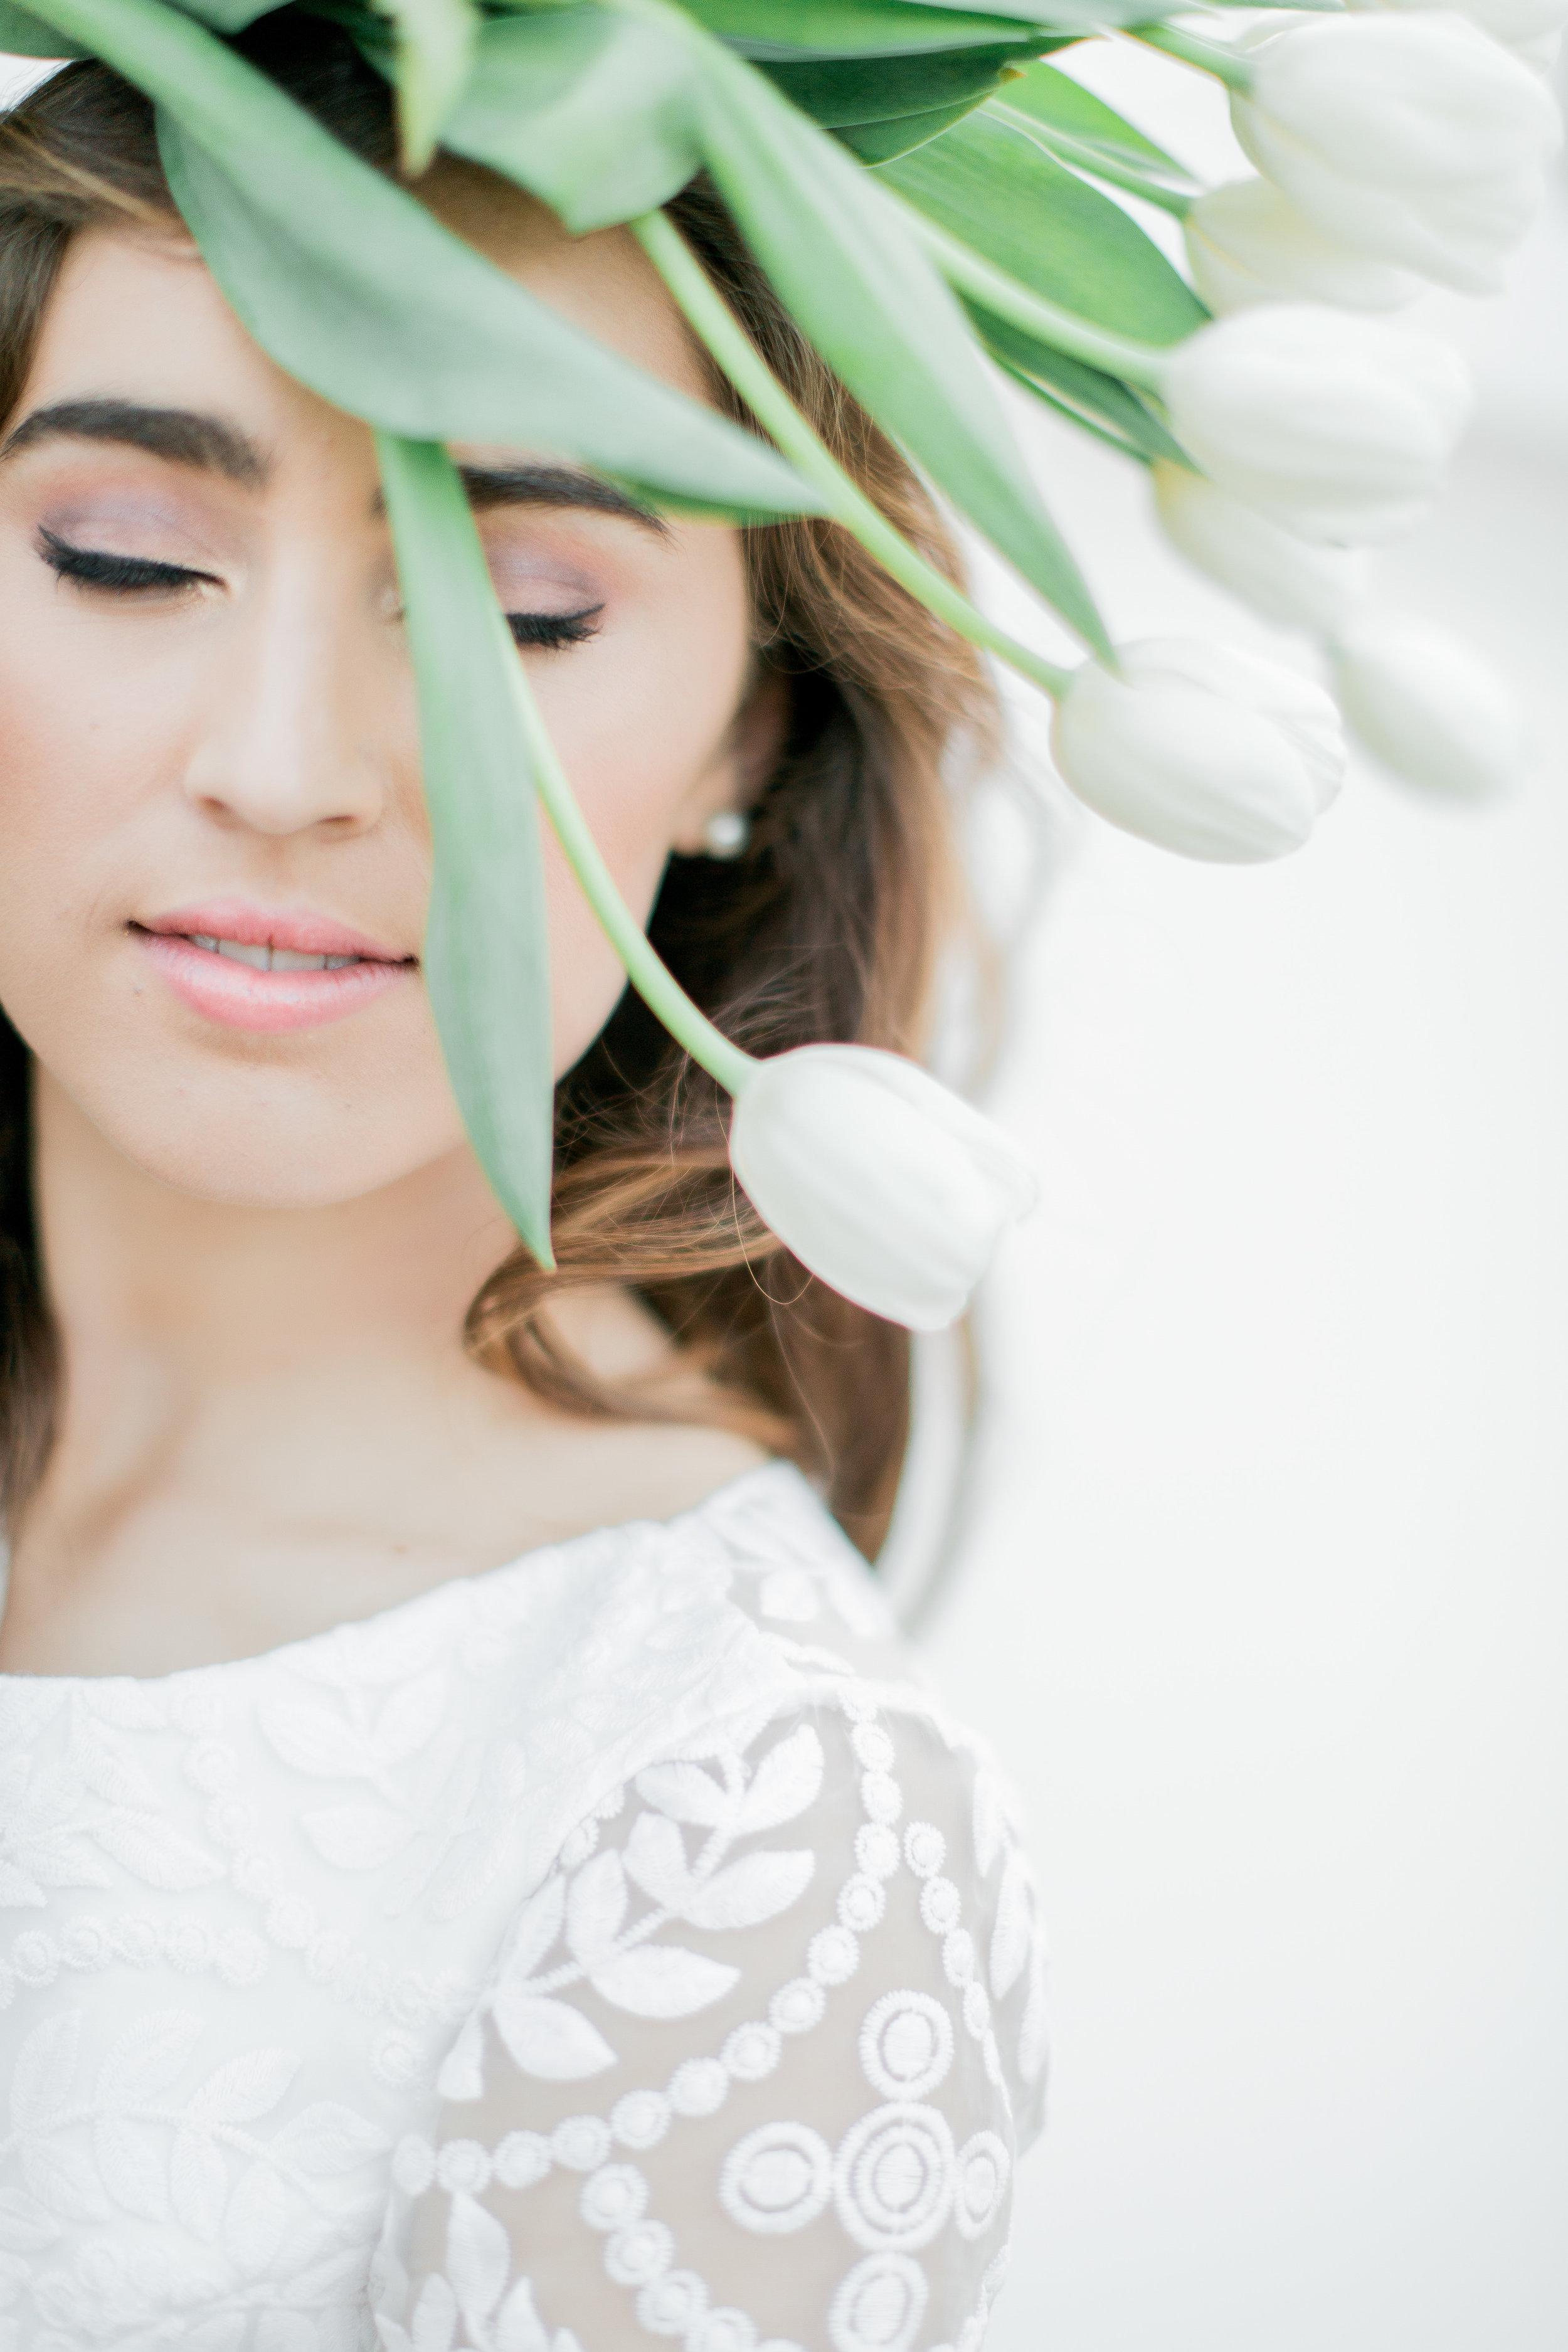 gauteng wedding photographer clareece smit09.jpg